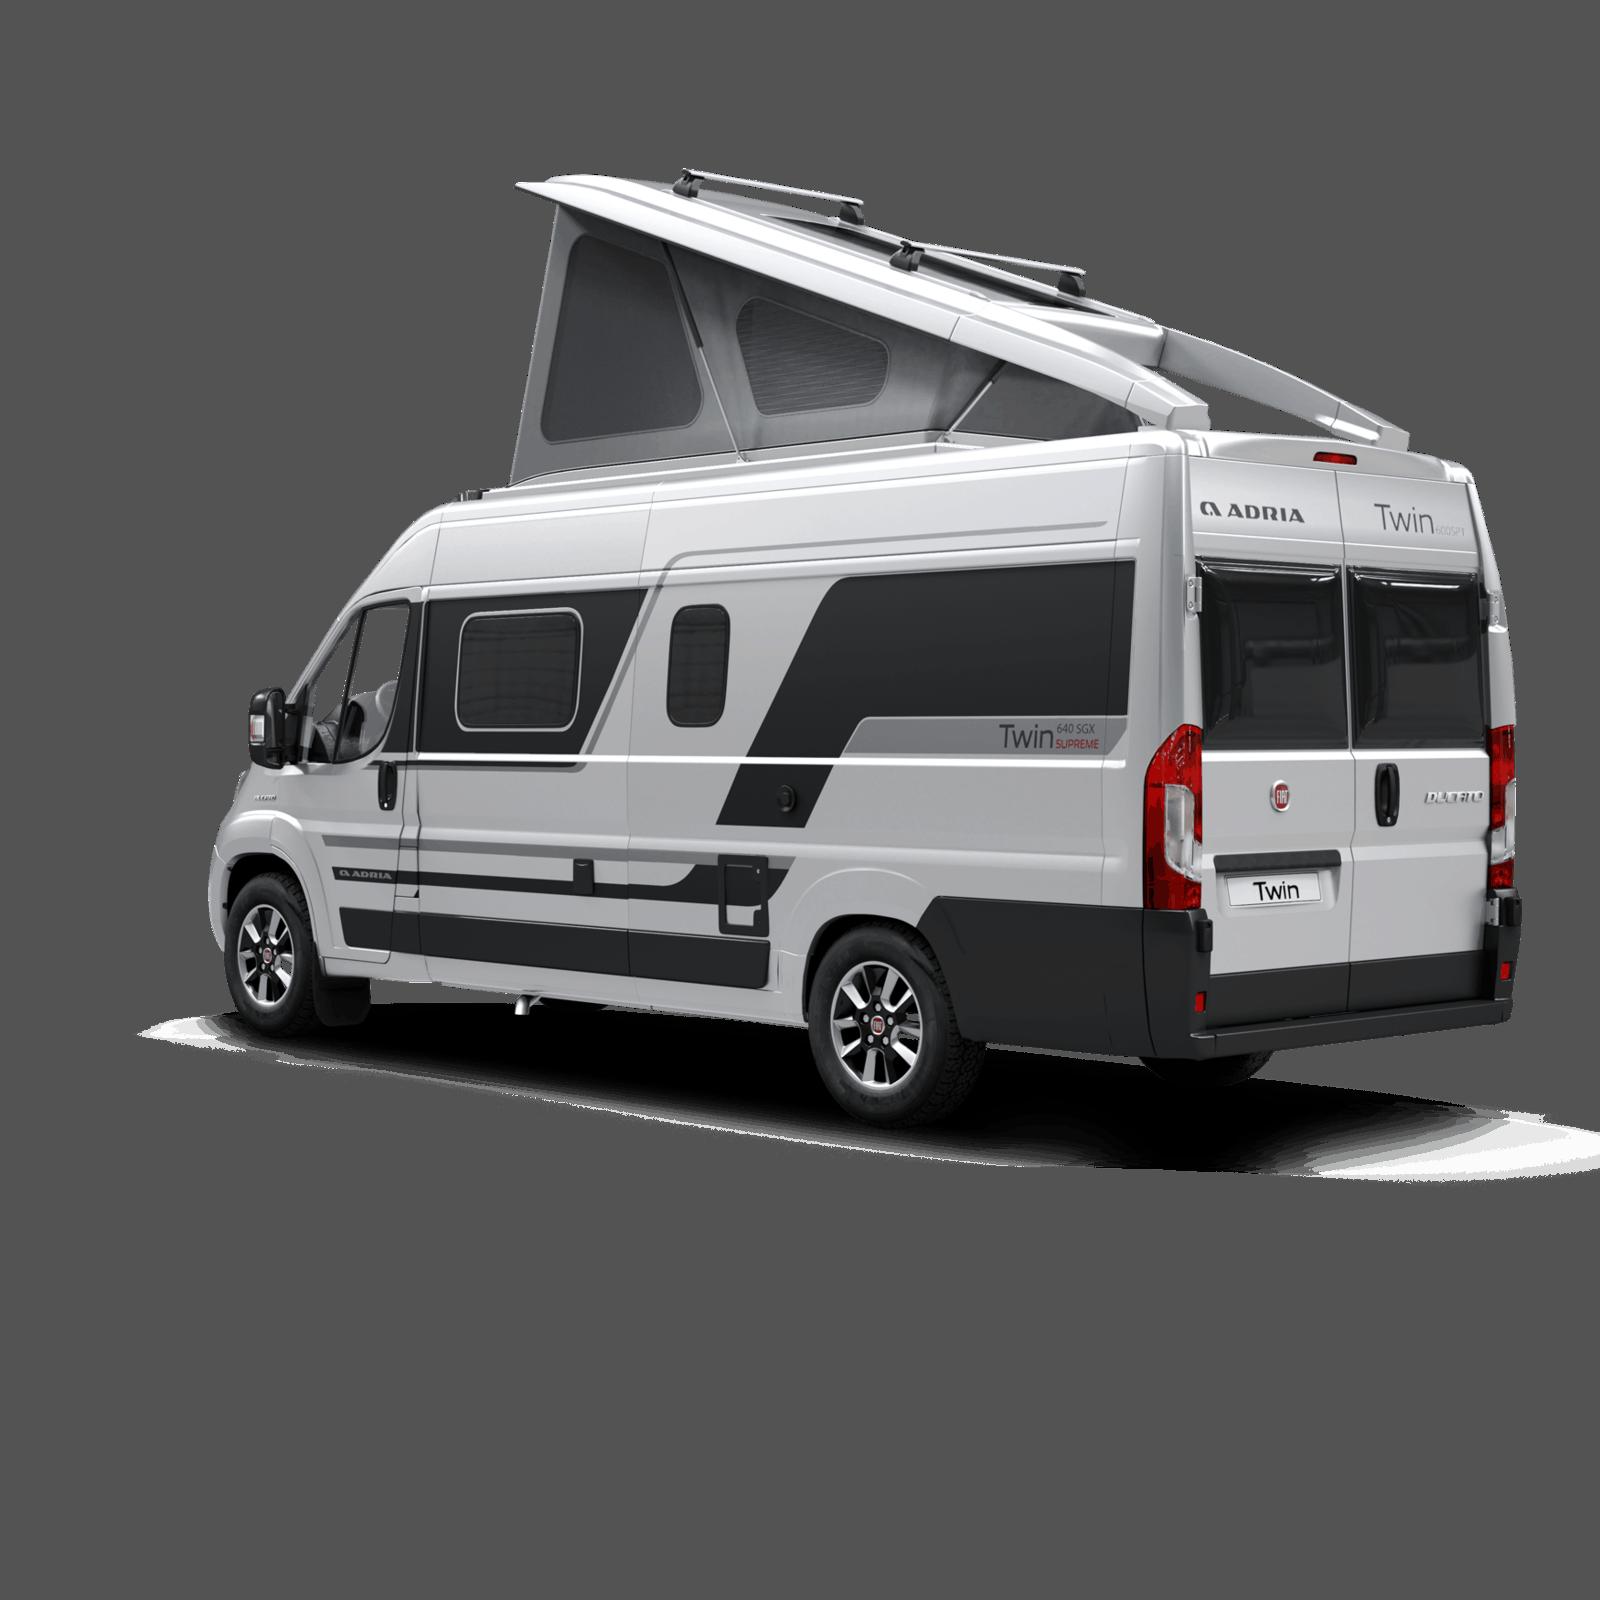 Adria Twin 640 SGX Nowość Caravan Salon